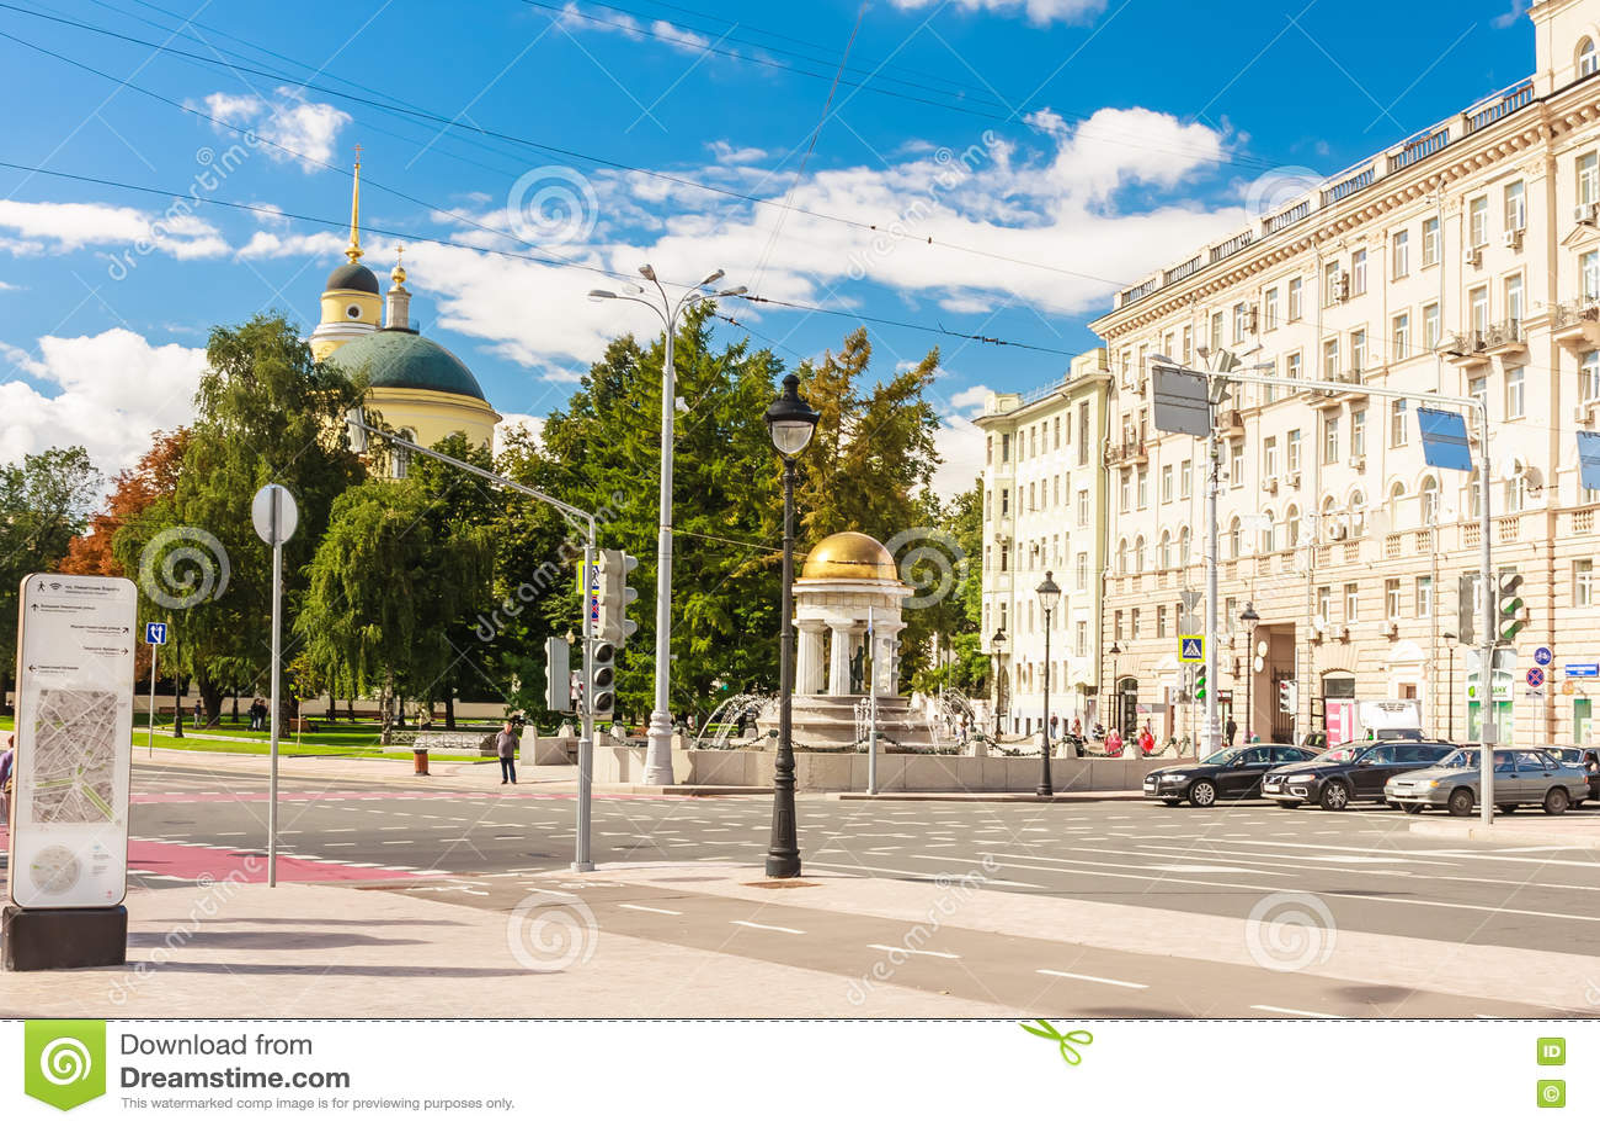 Nikitsky gates